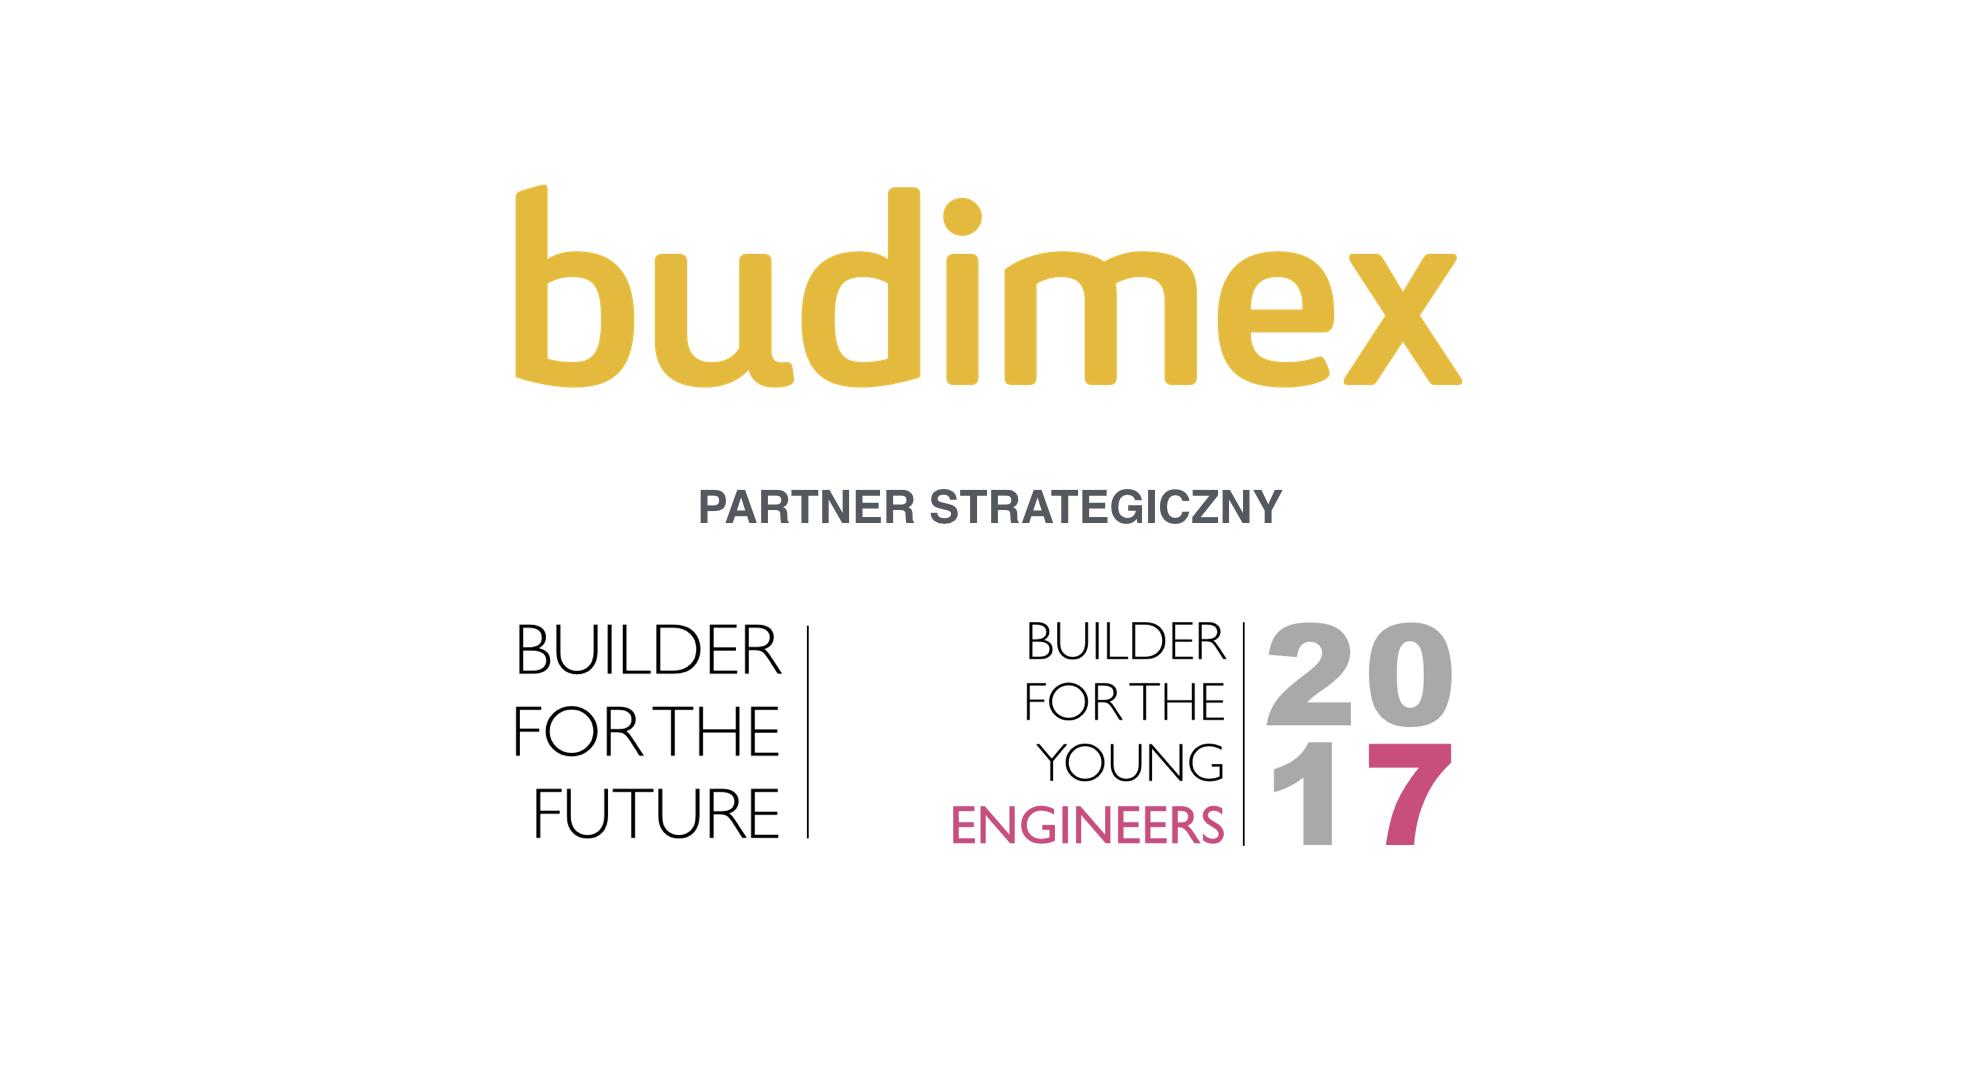 BUDIMEX FOR THE FUTURE